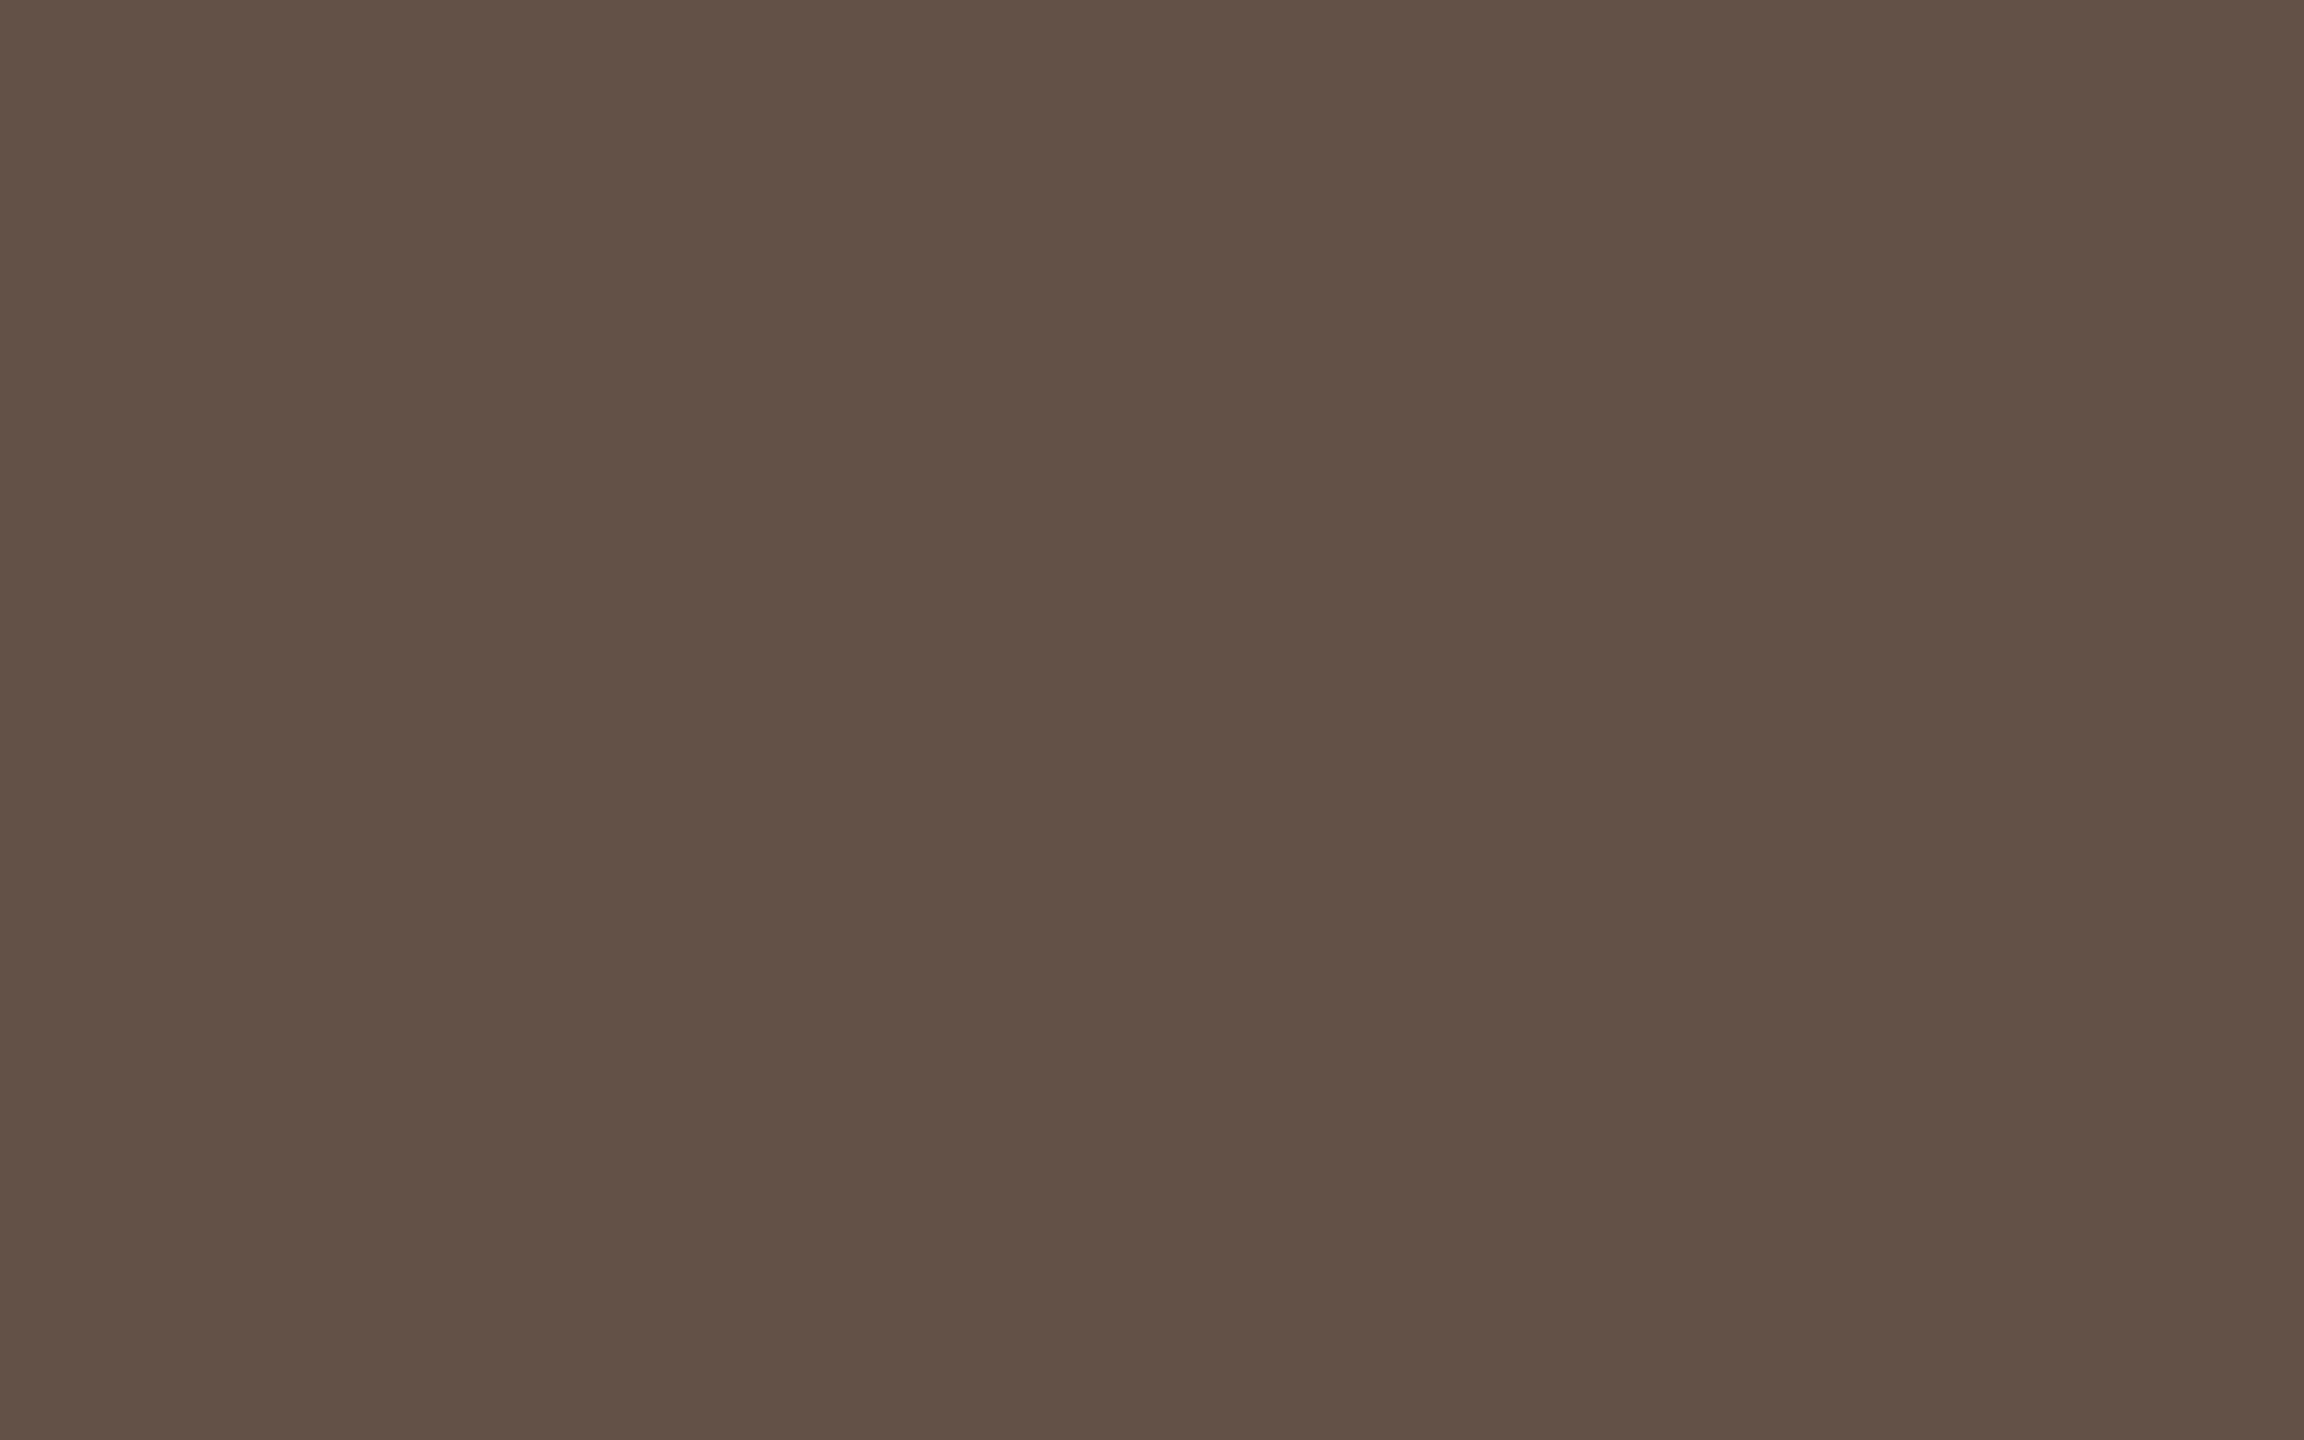 2304x1440 Umber Solid Color Background